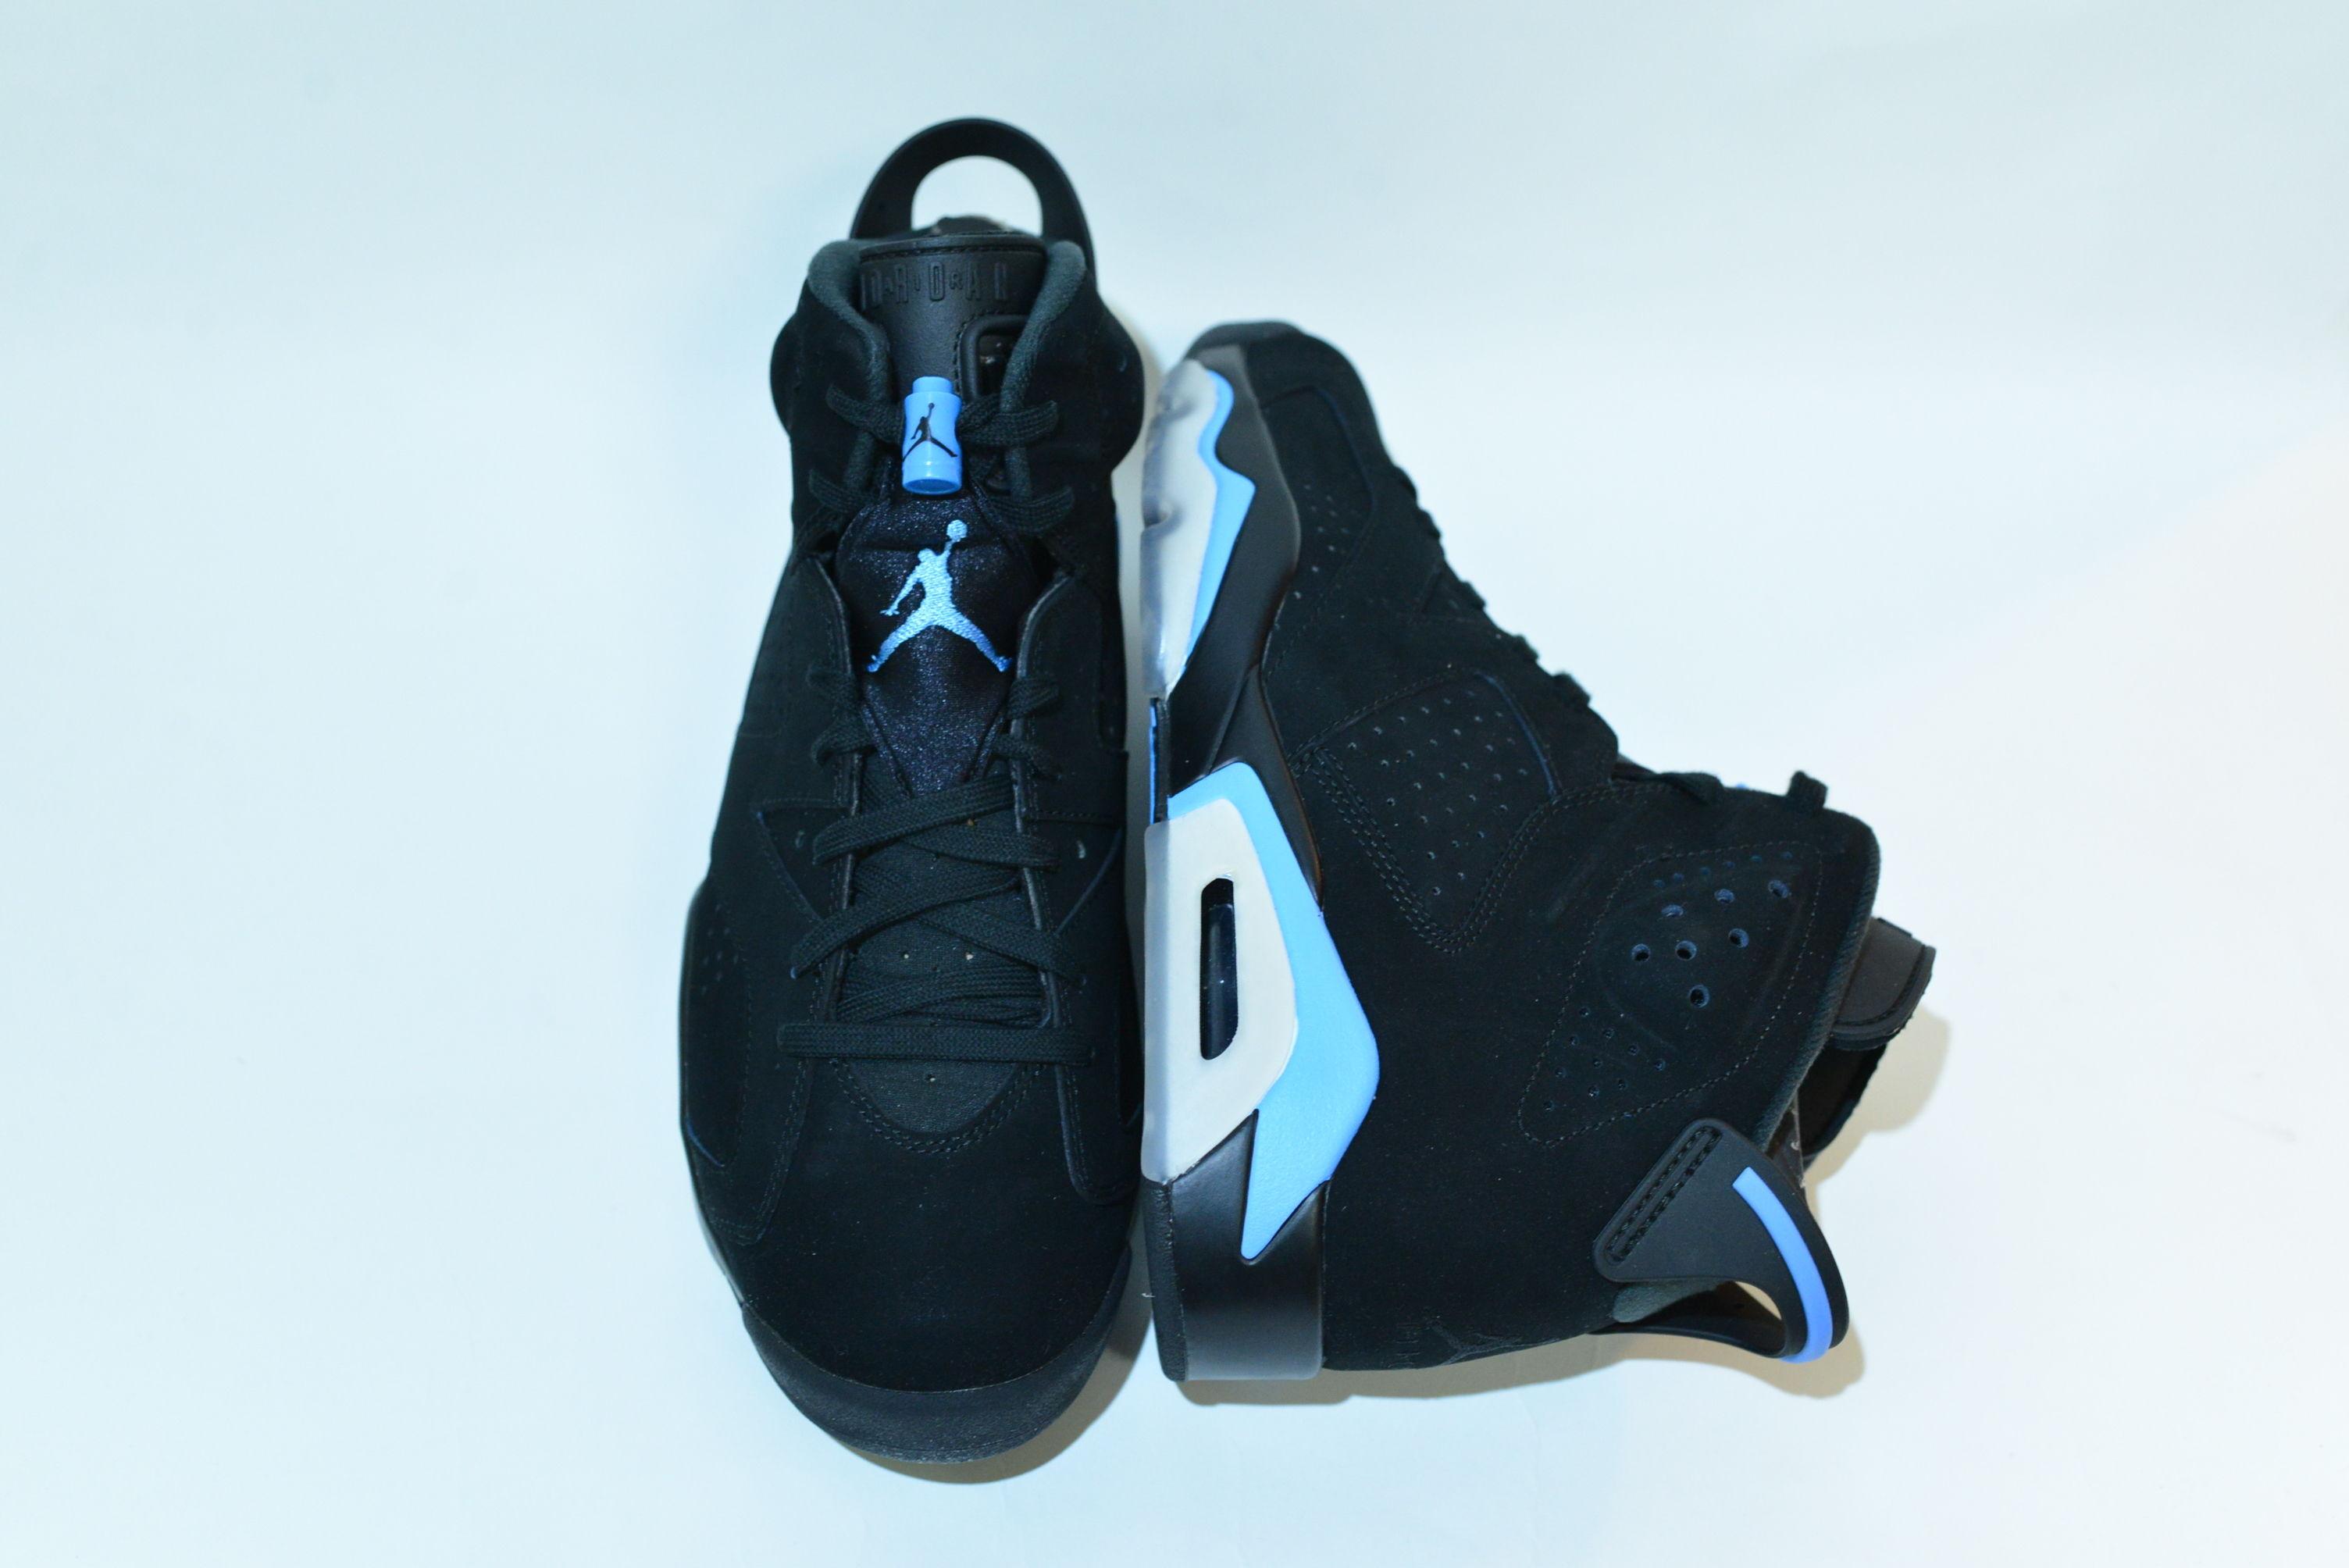 NIKE AIR JORDAN 6 RETRO / BLACK / UNIVERSITY BLUE / 27.5cm